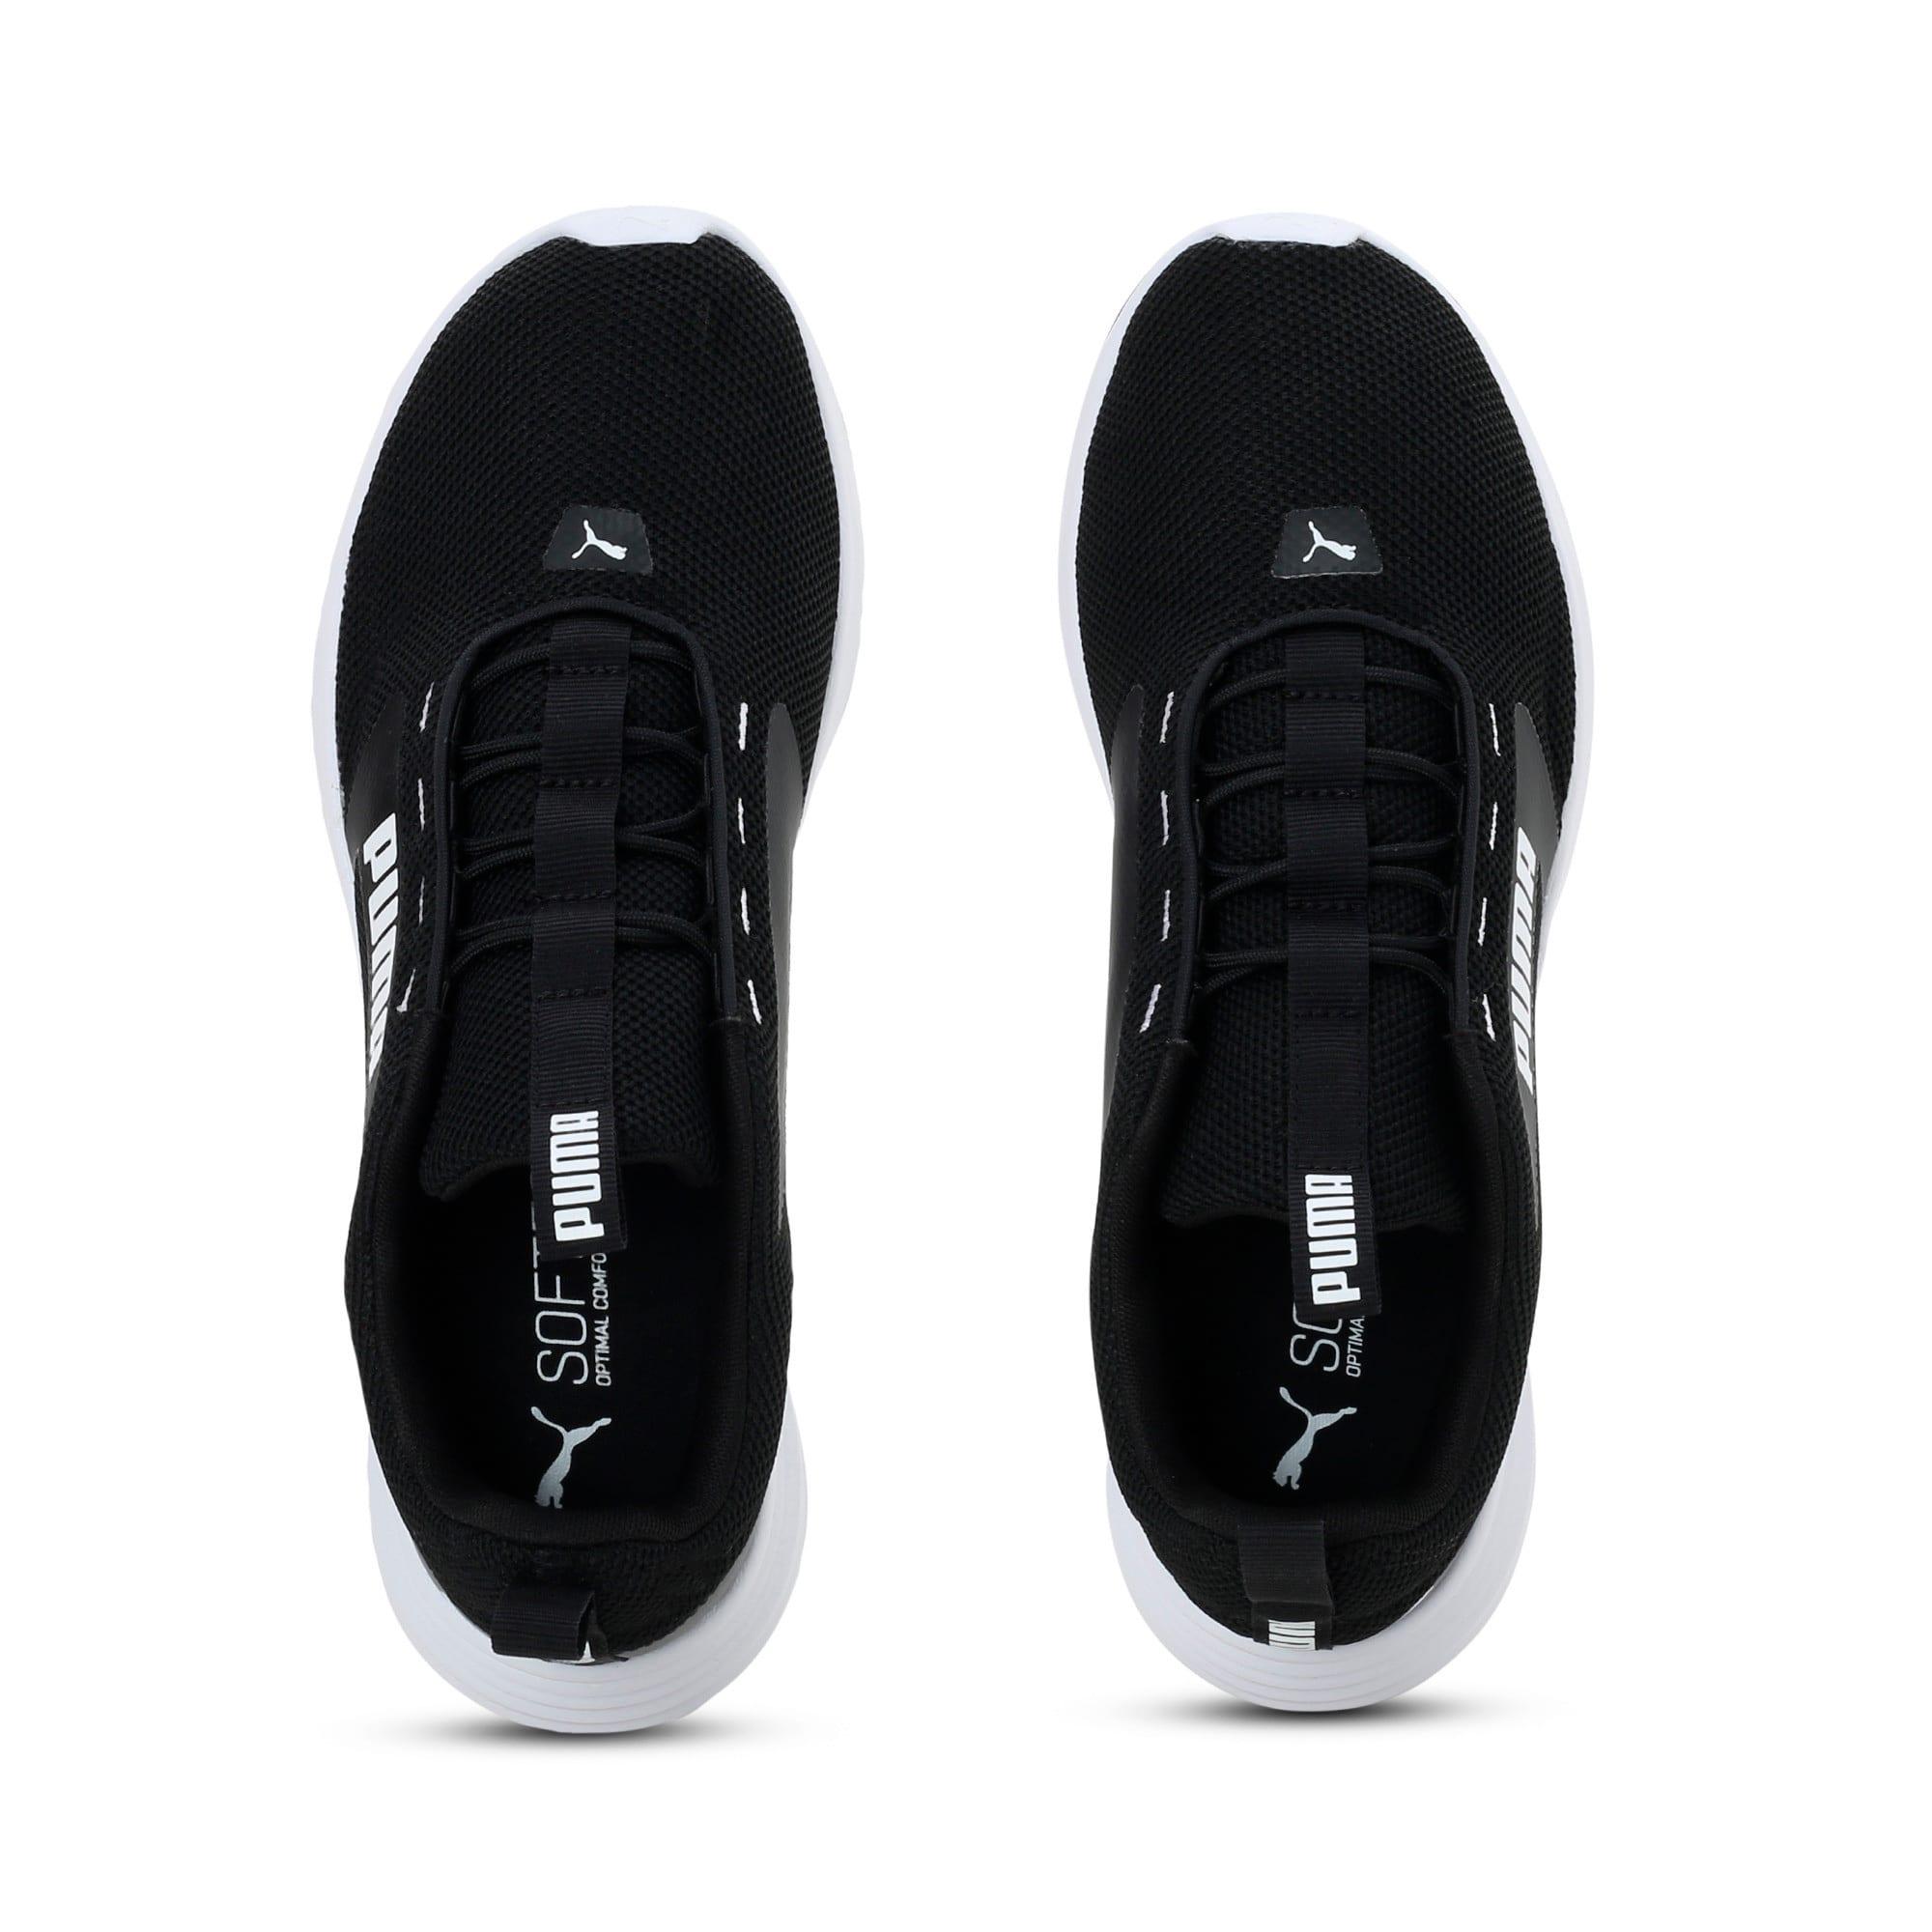 Thumbnail 4 of Extractor Running Shoes, Puma Black-Puma White, medium-IND